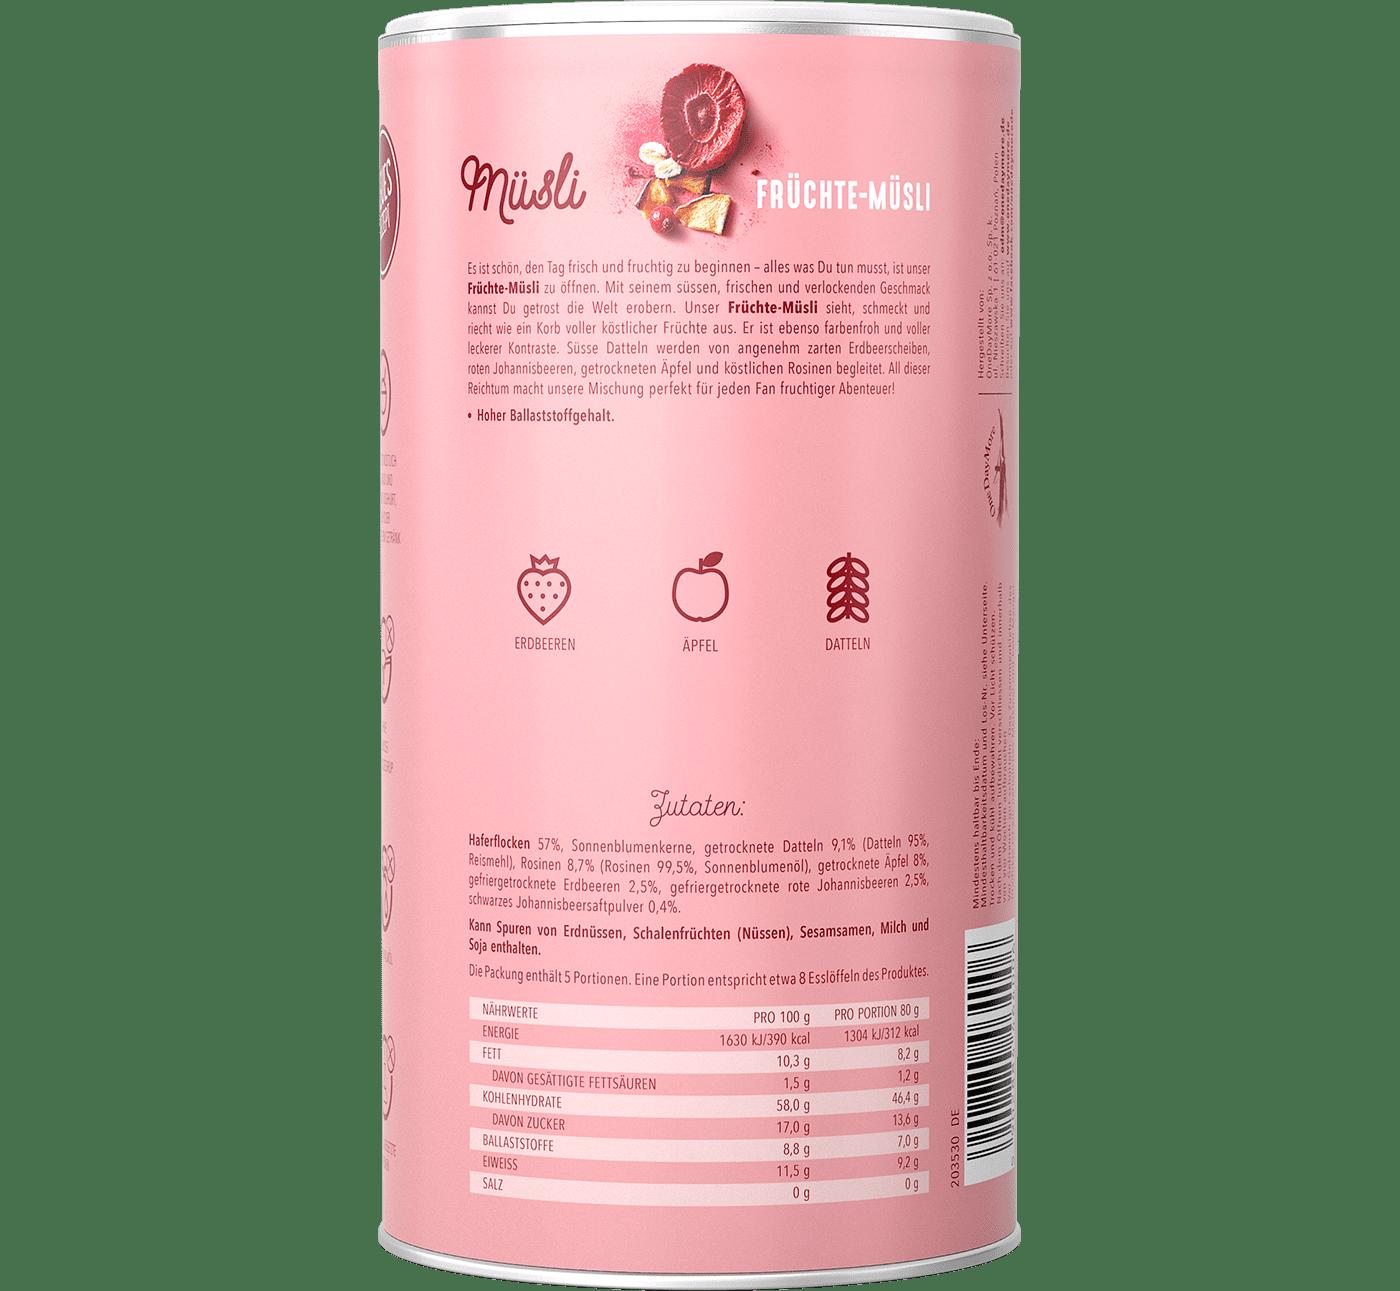 ruchte-musli-neues-rezept-onedaymore-tyl-1400×1291